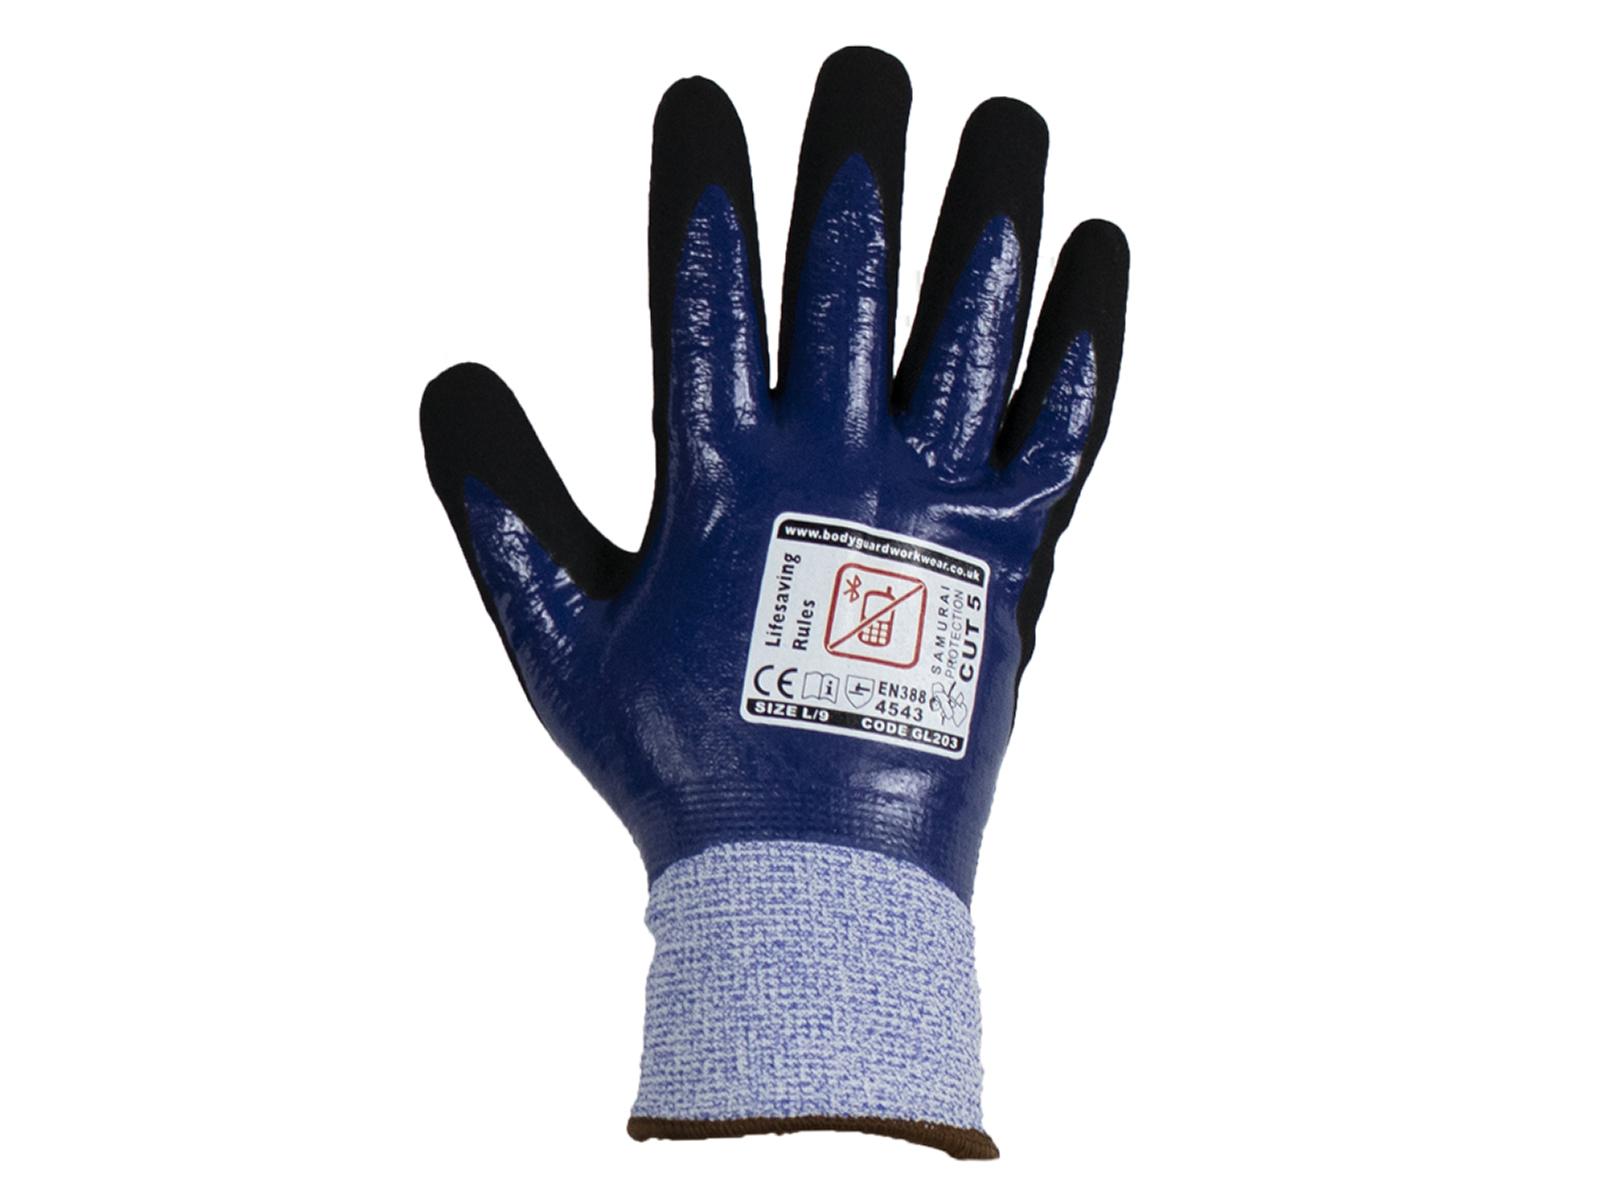 Samurai Thermo Wet Cut 5 Safety glove w/ Fleece Liner